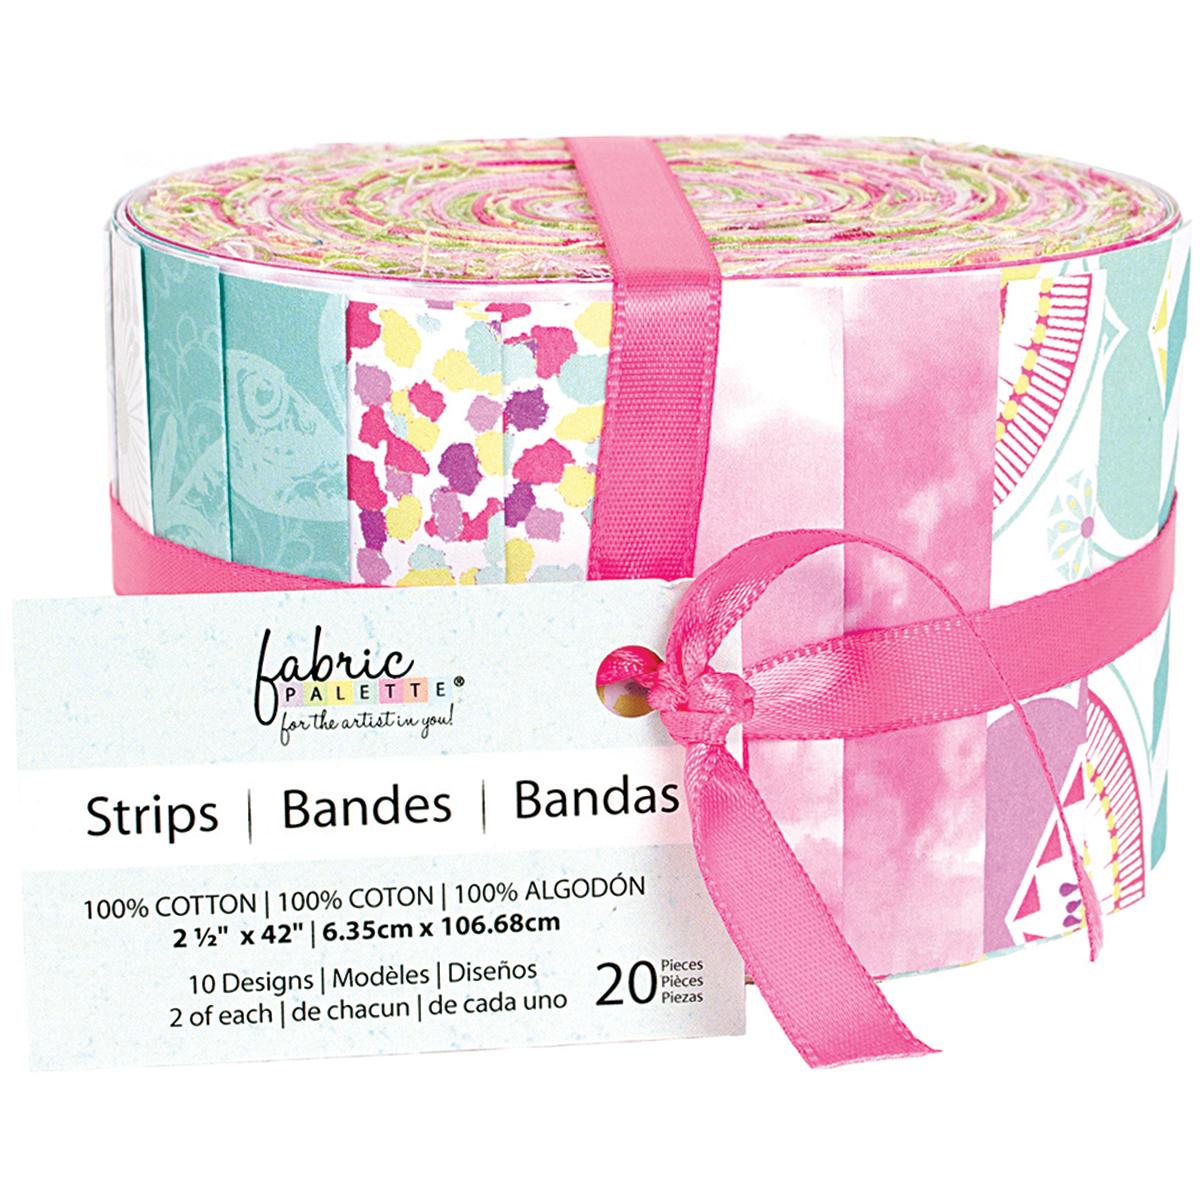 "Fabric Palette Jellies 2.5""X42"" 20/Pkg-Popsicle II"